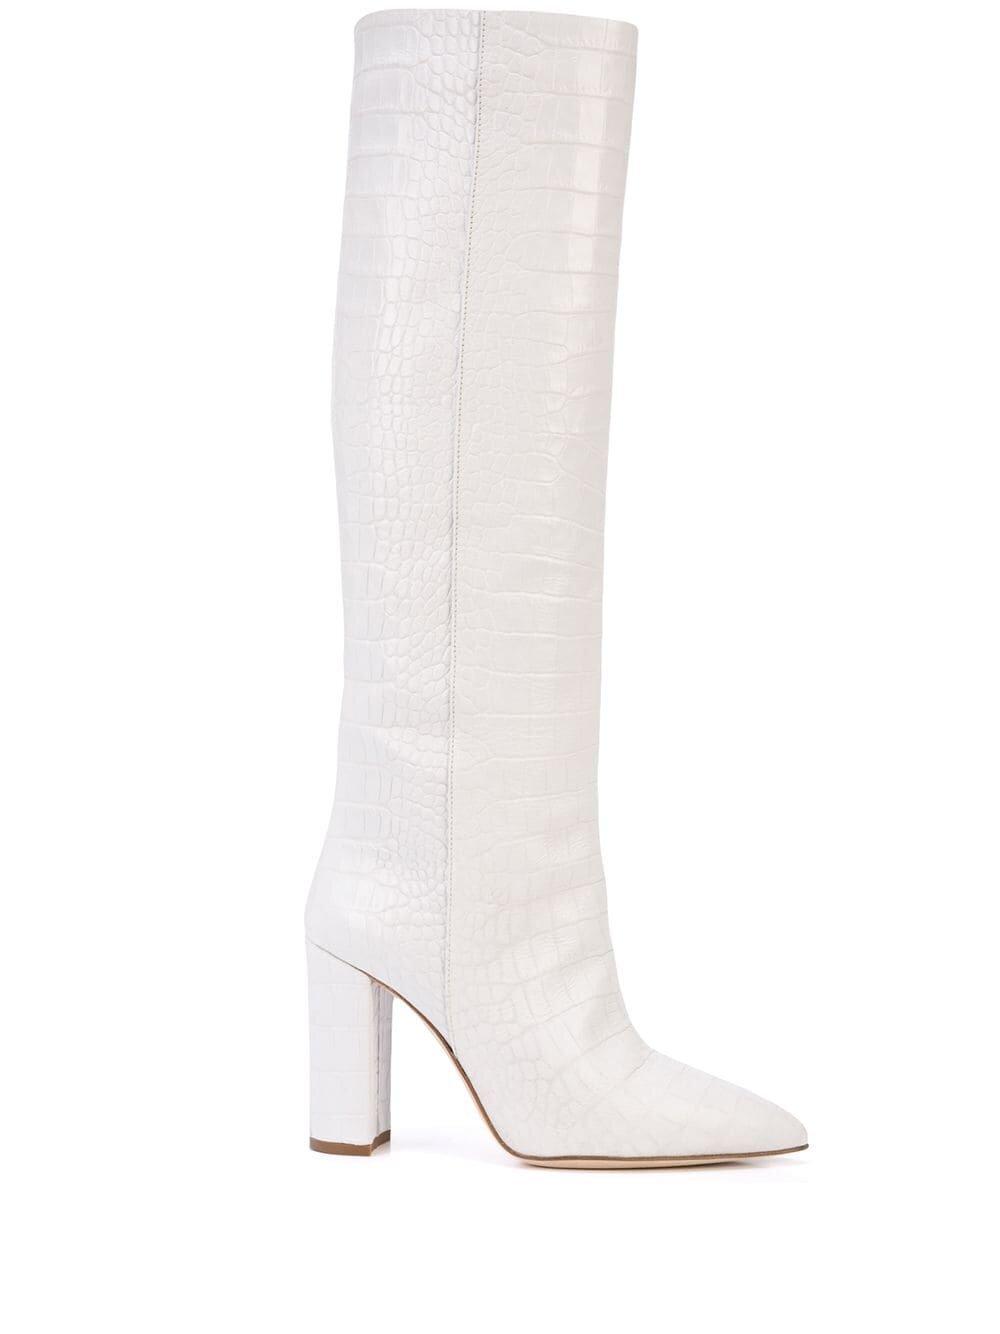 Paris Texas White Knee High Boot